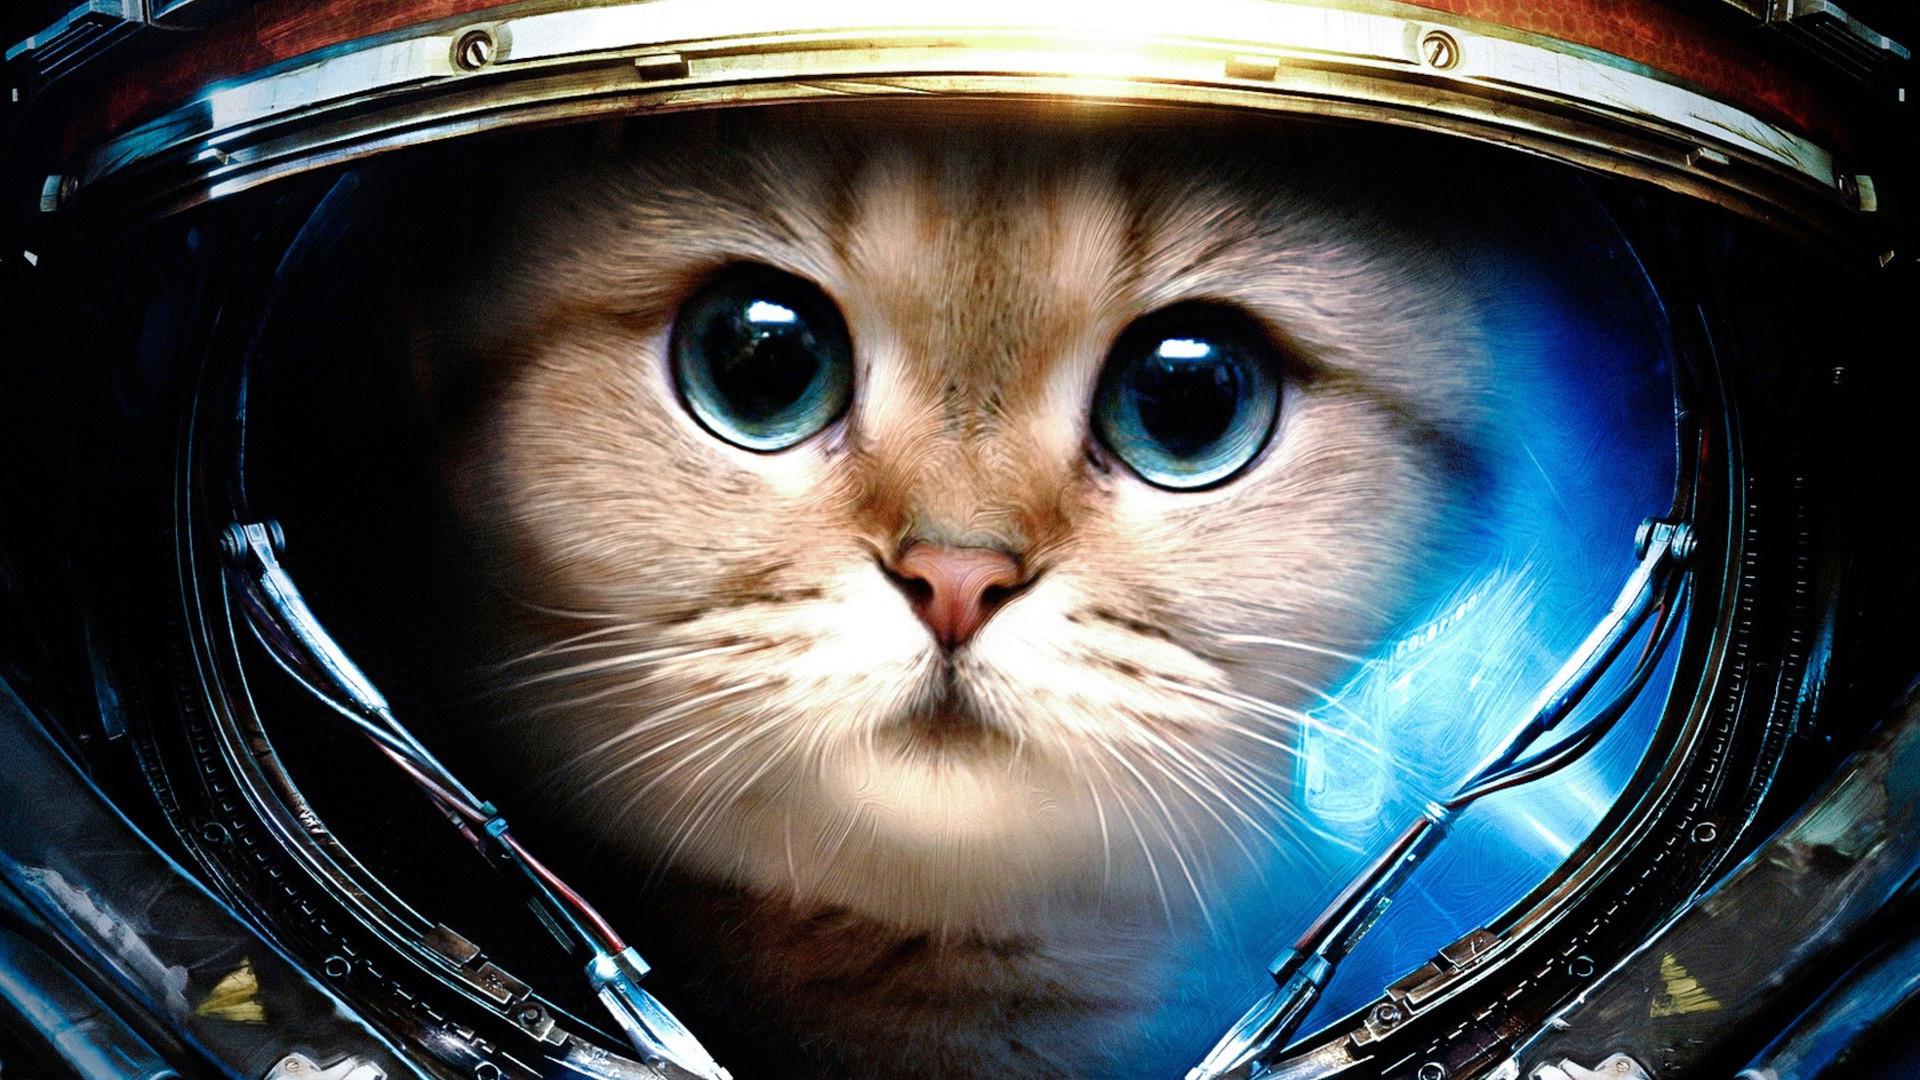 Space Cat Wallpapers   wallpaper, wallpaper hd, background desktop